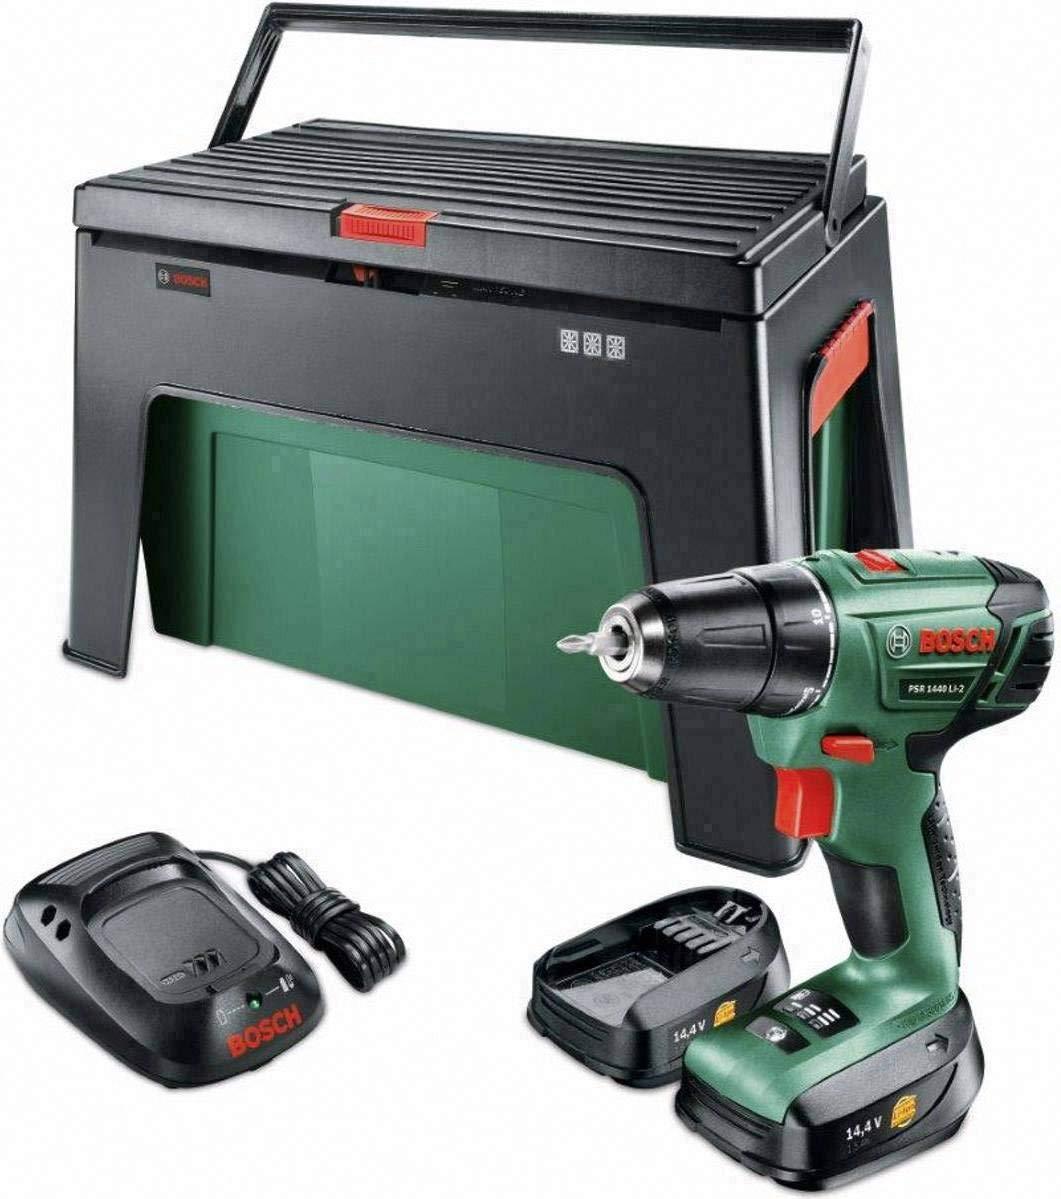 Bosch PSR 1440LI-2 Cordless Drill Driver